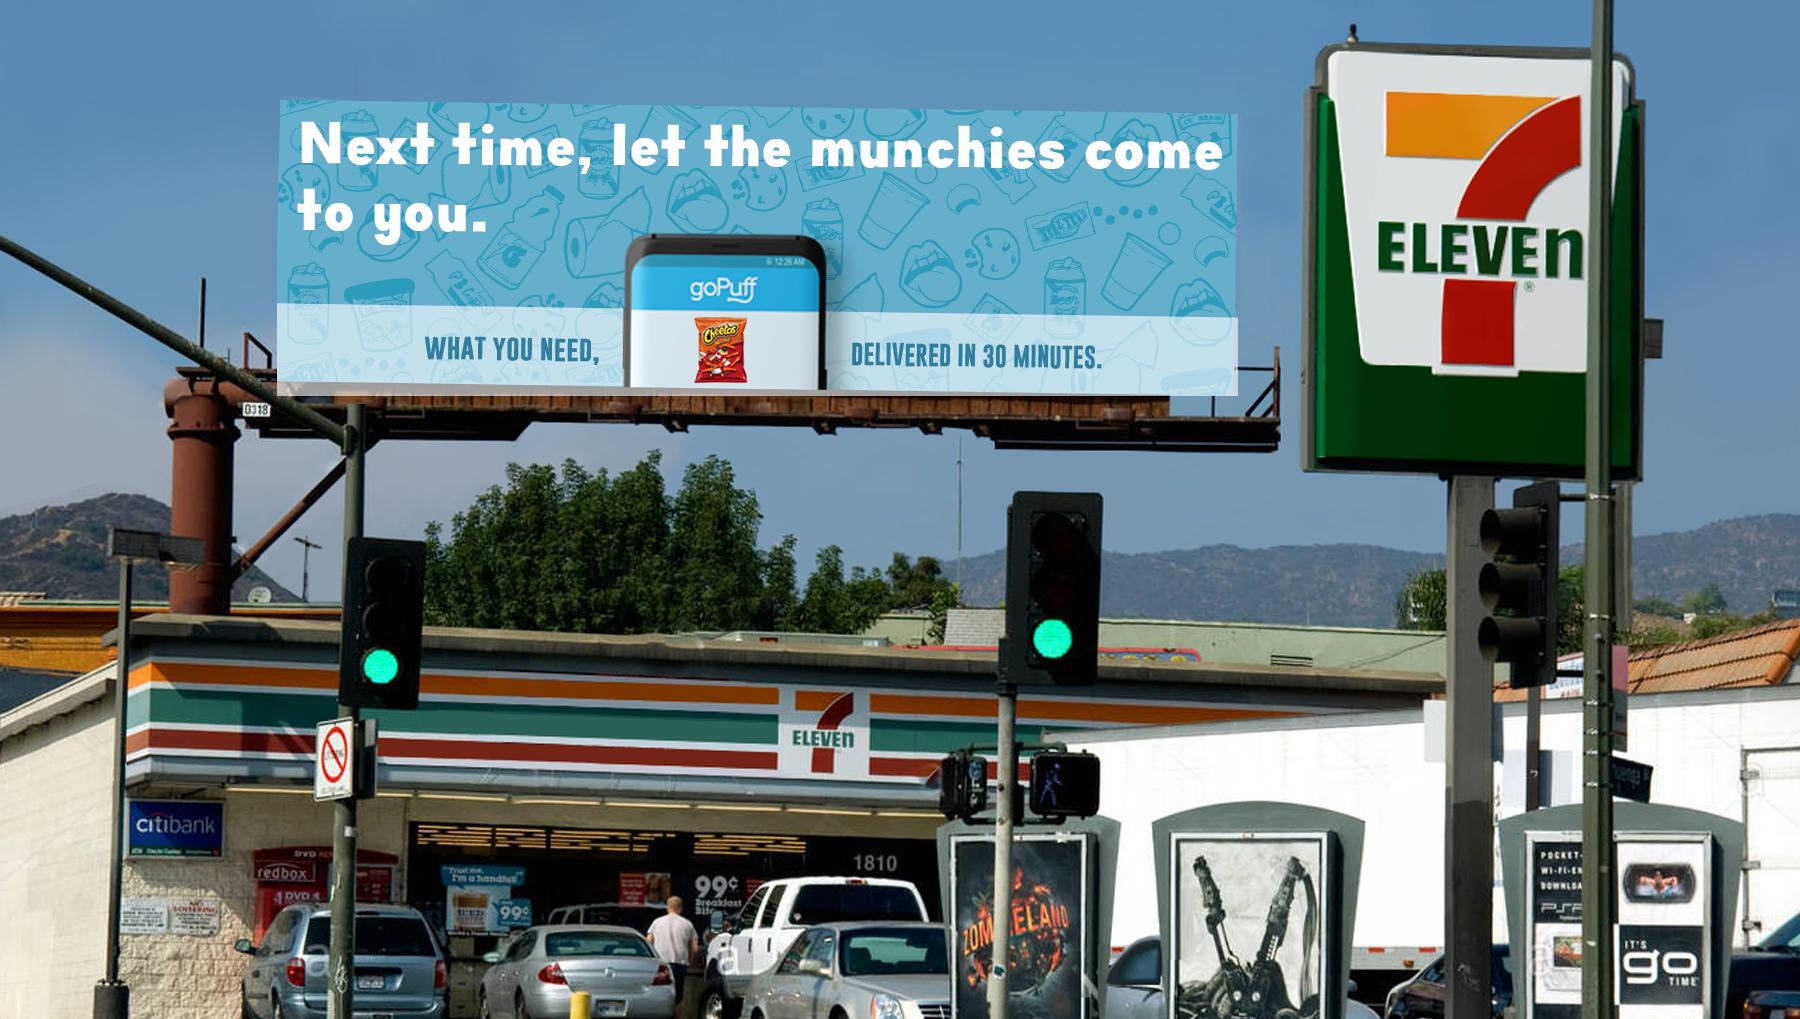 Billboard_7Eleven.png